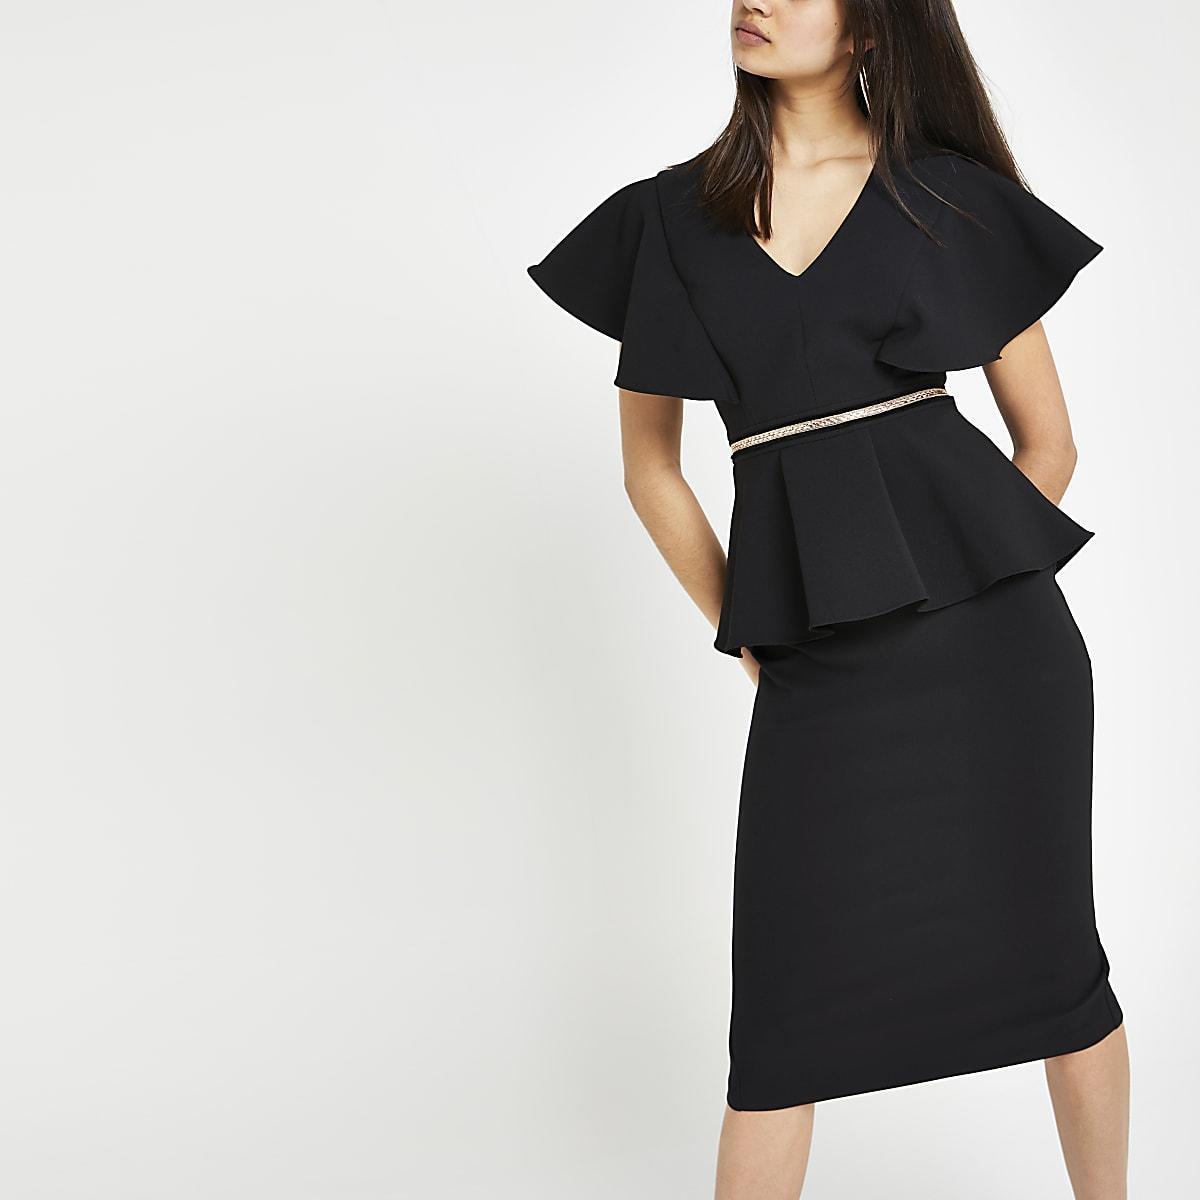 d08dad364eae Black peplum bodycon dress - Bodycon Dresses - Dresses - women